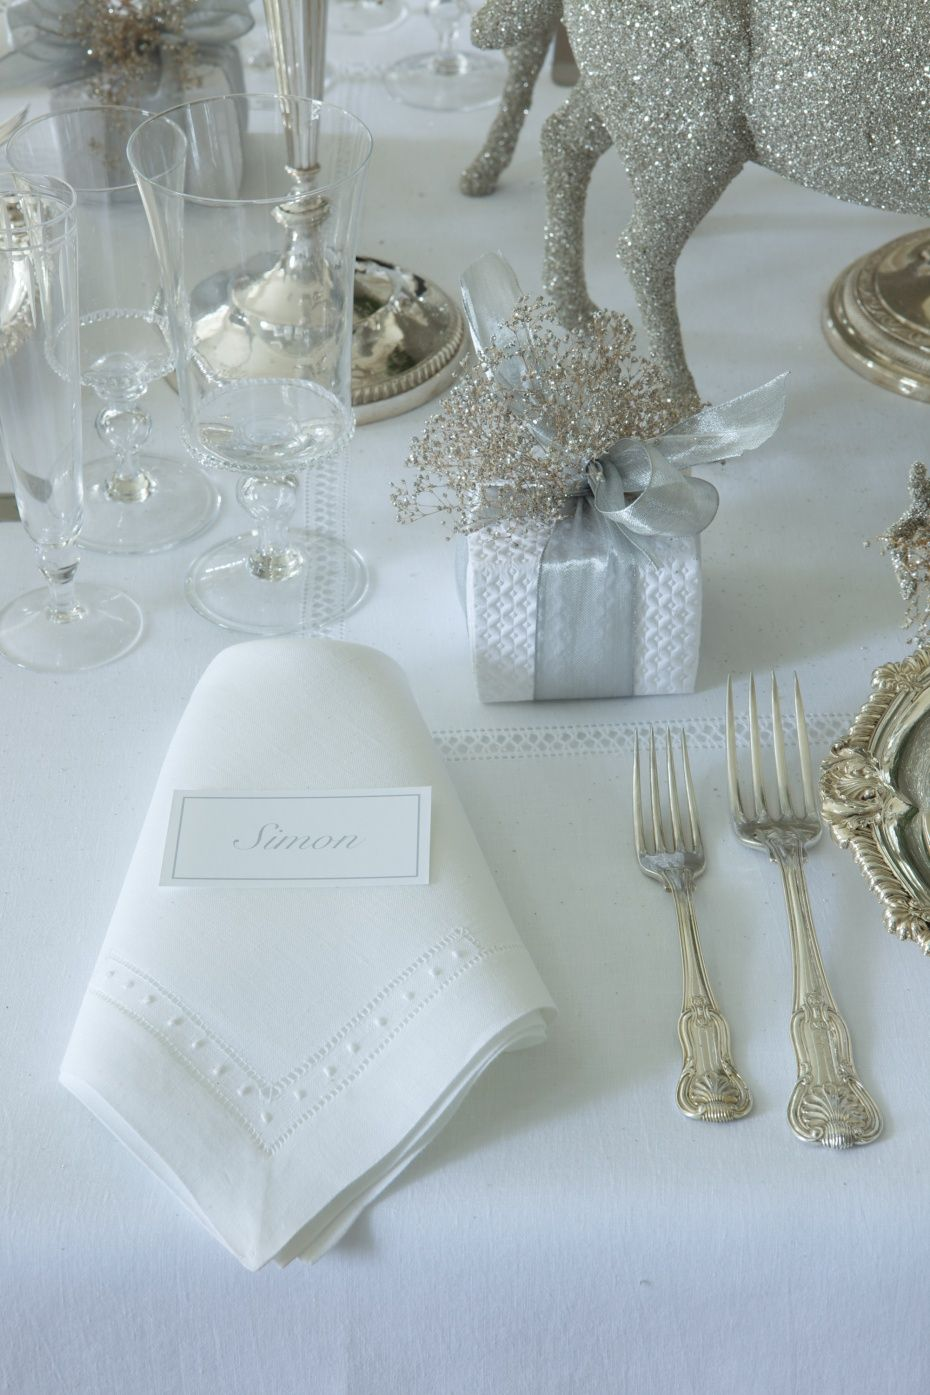 Carolyne Roehm Winter Table